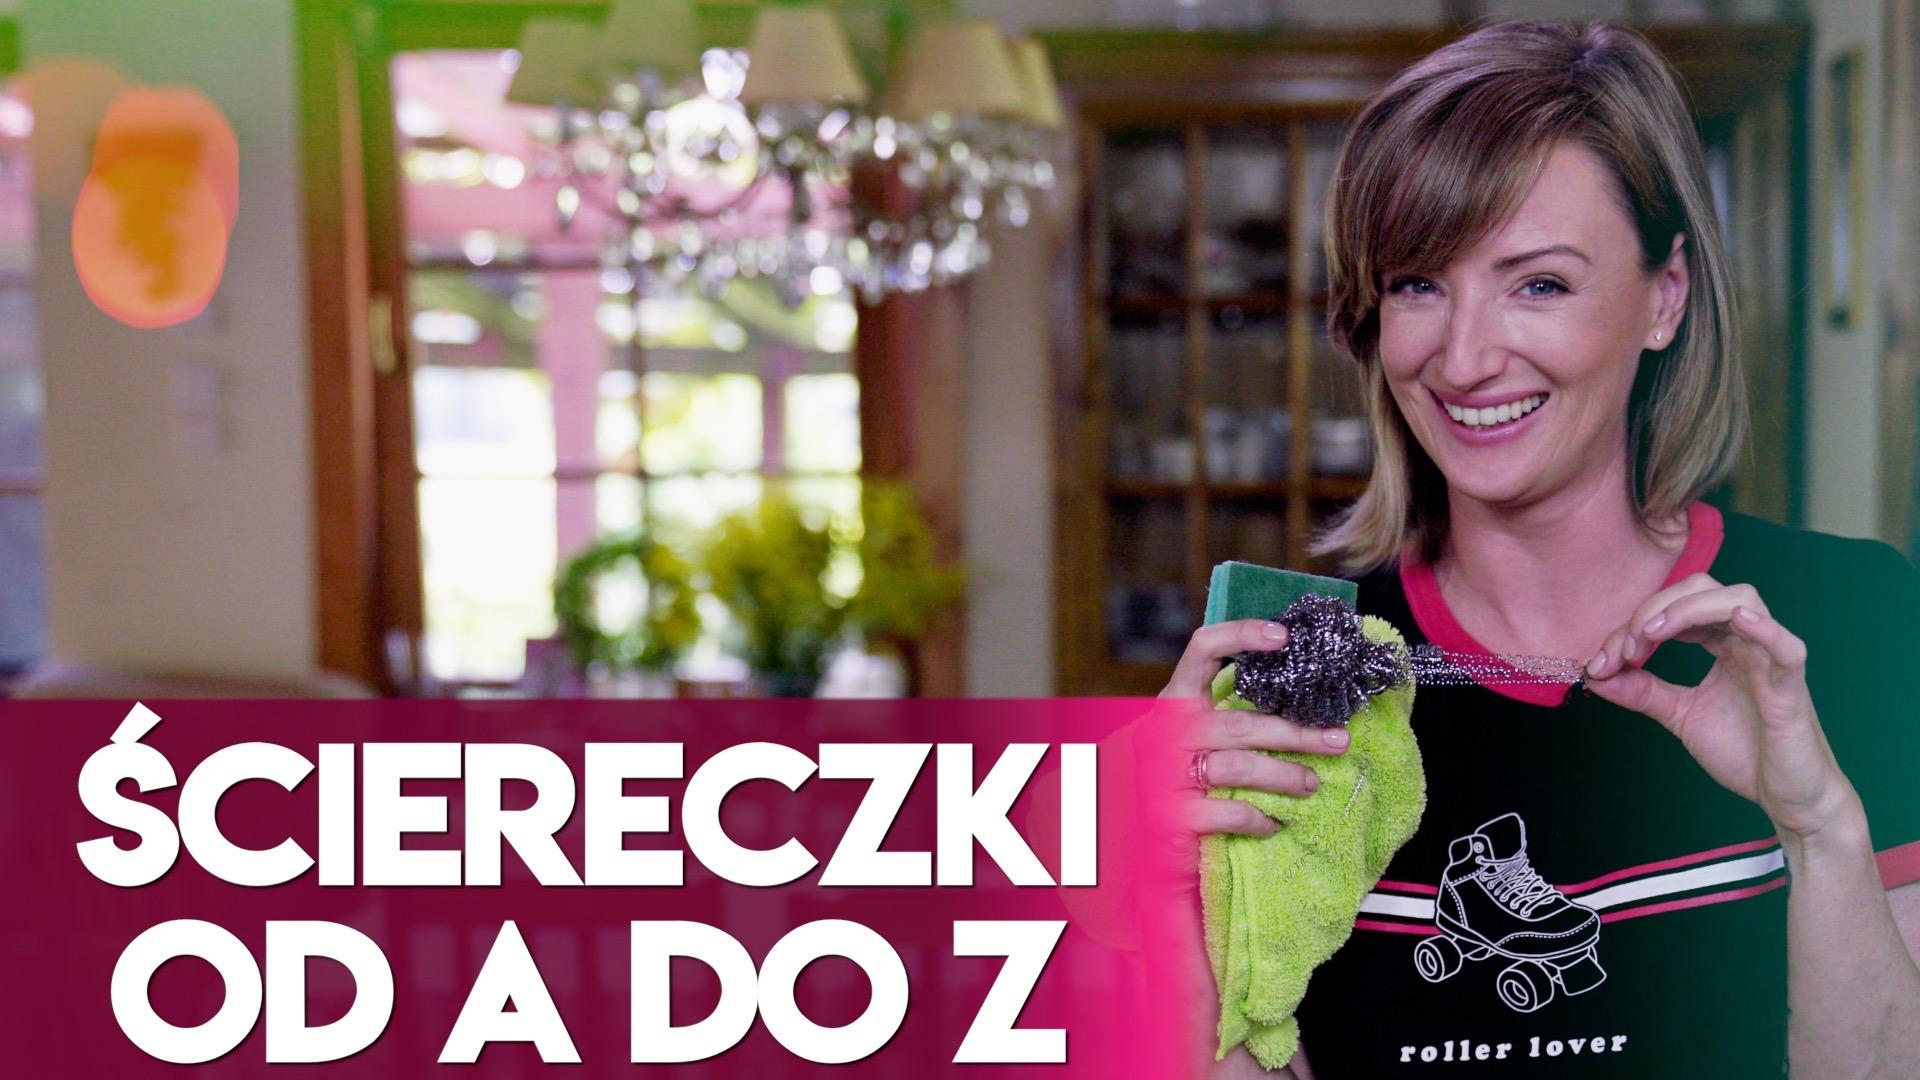 SCIERECZKI_1